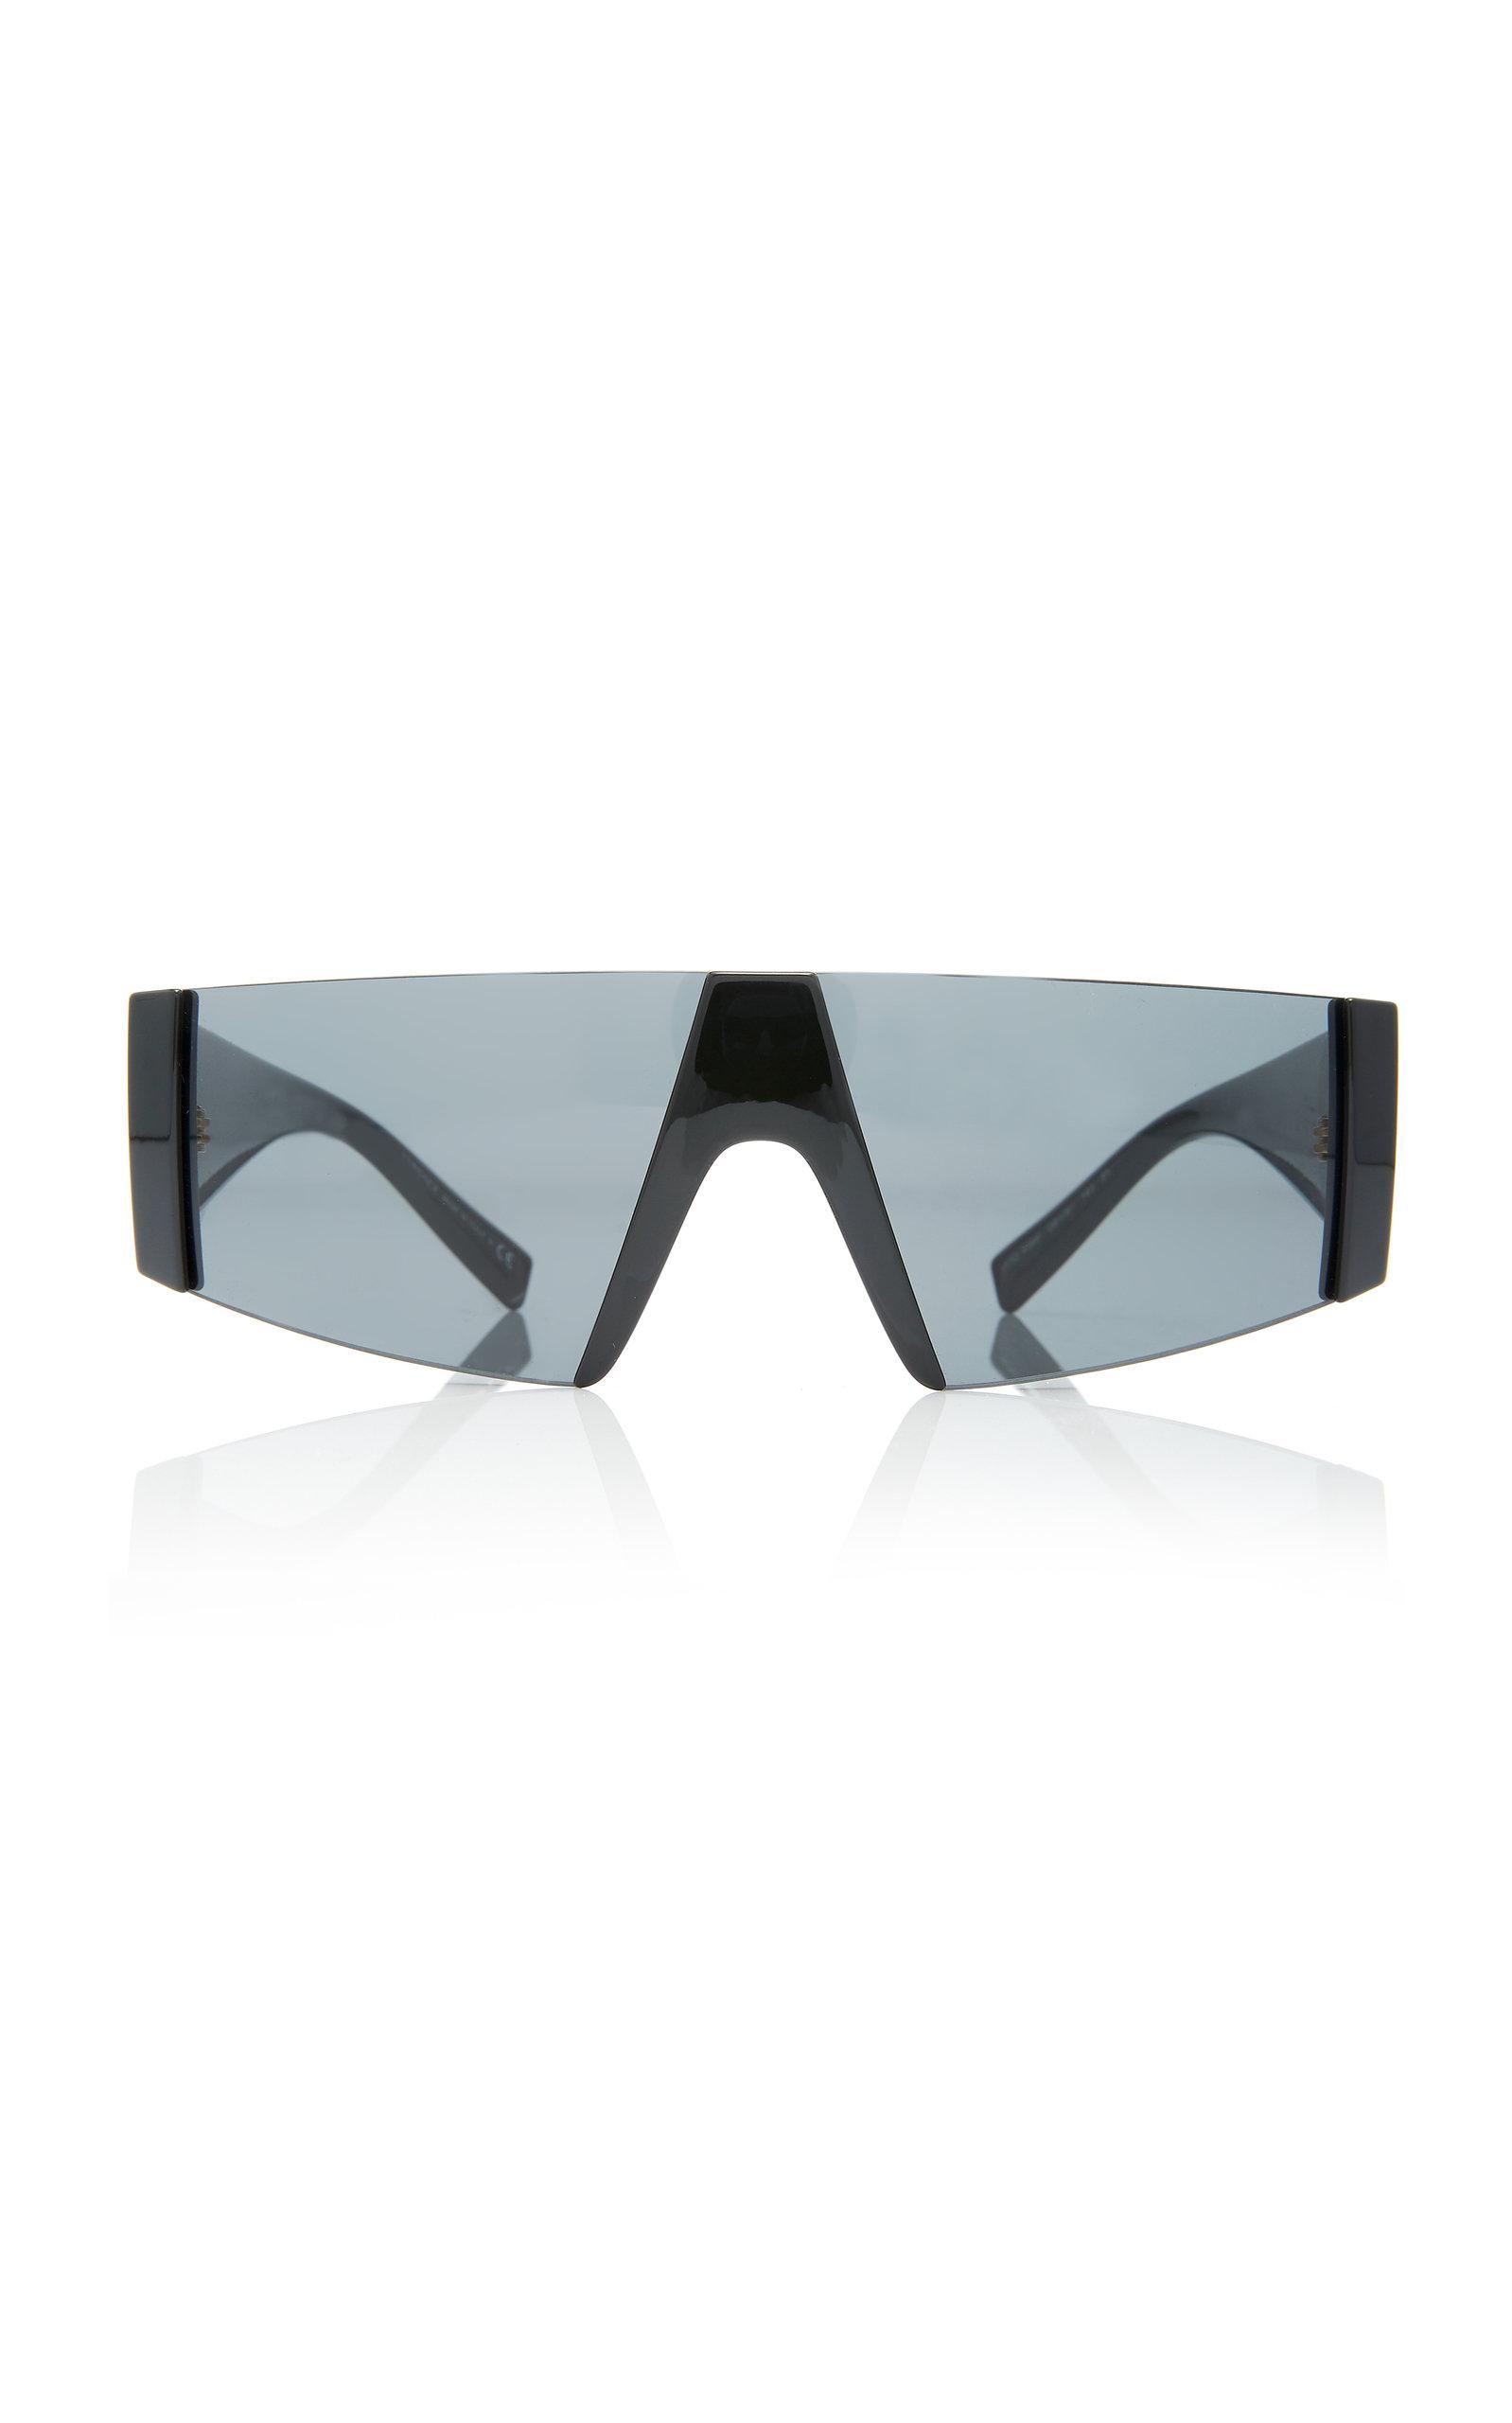 b2271347e2d8 Square-Frame Acetate Sunglasses by Versace Sunglasses | Moda Operandi